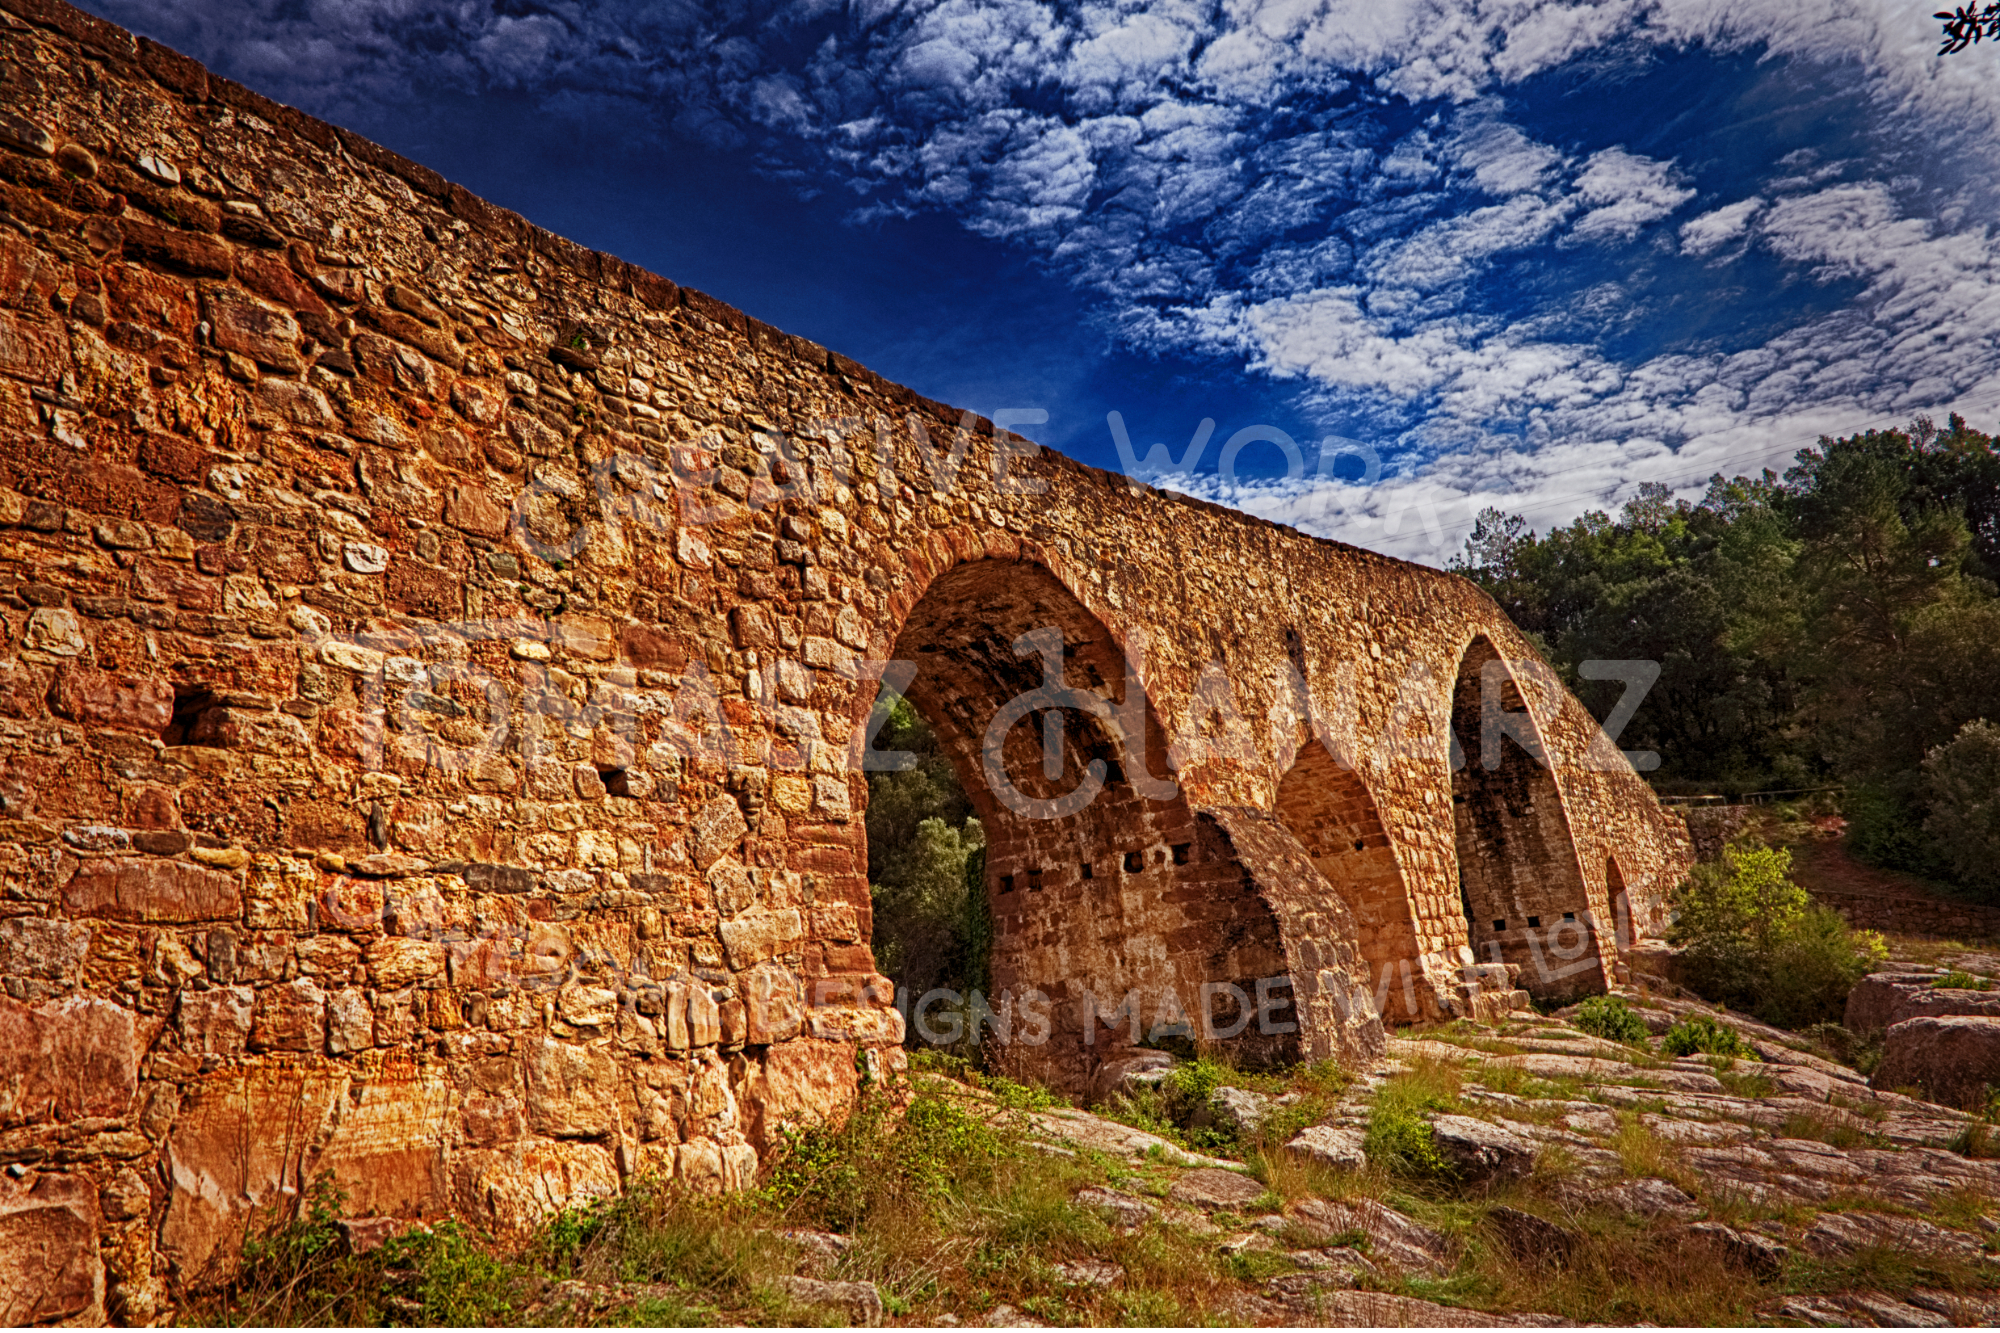 Gothic Stone Bridge Over The River Llobregat Photo Bundle example image 4